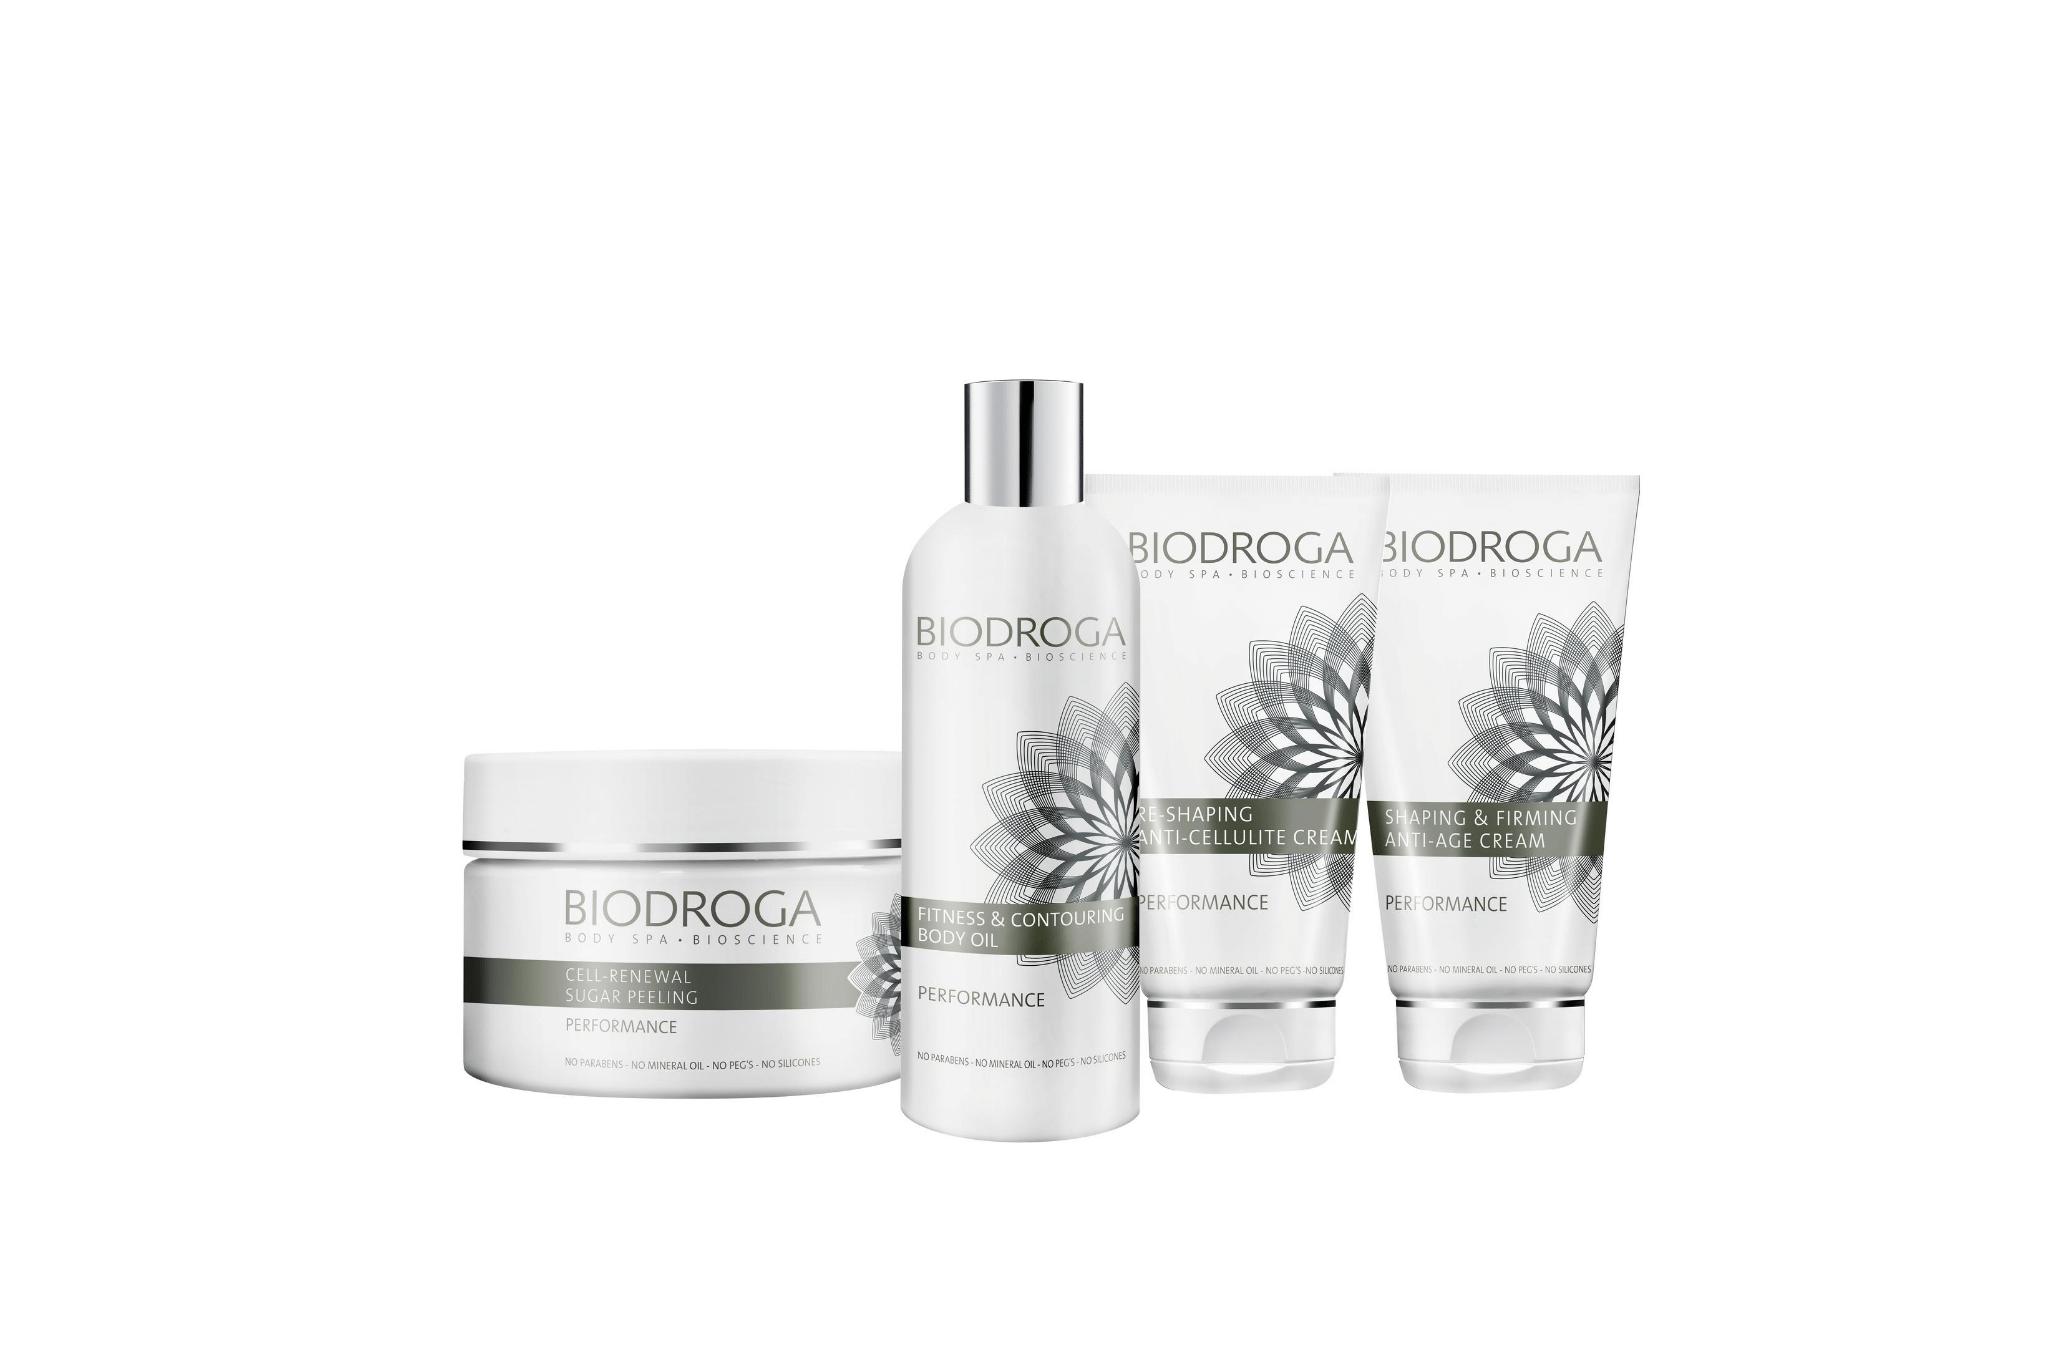 Biodroga body spa performance